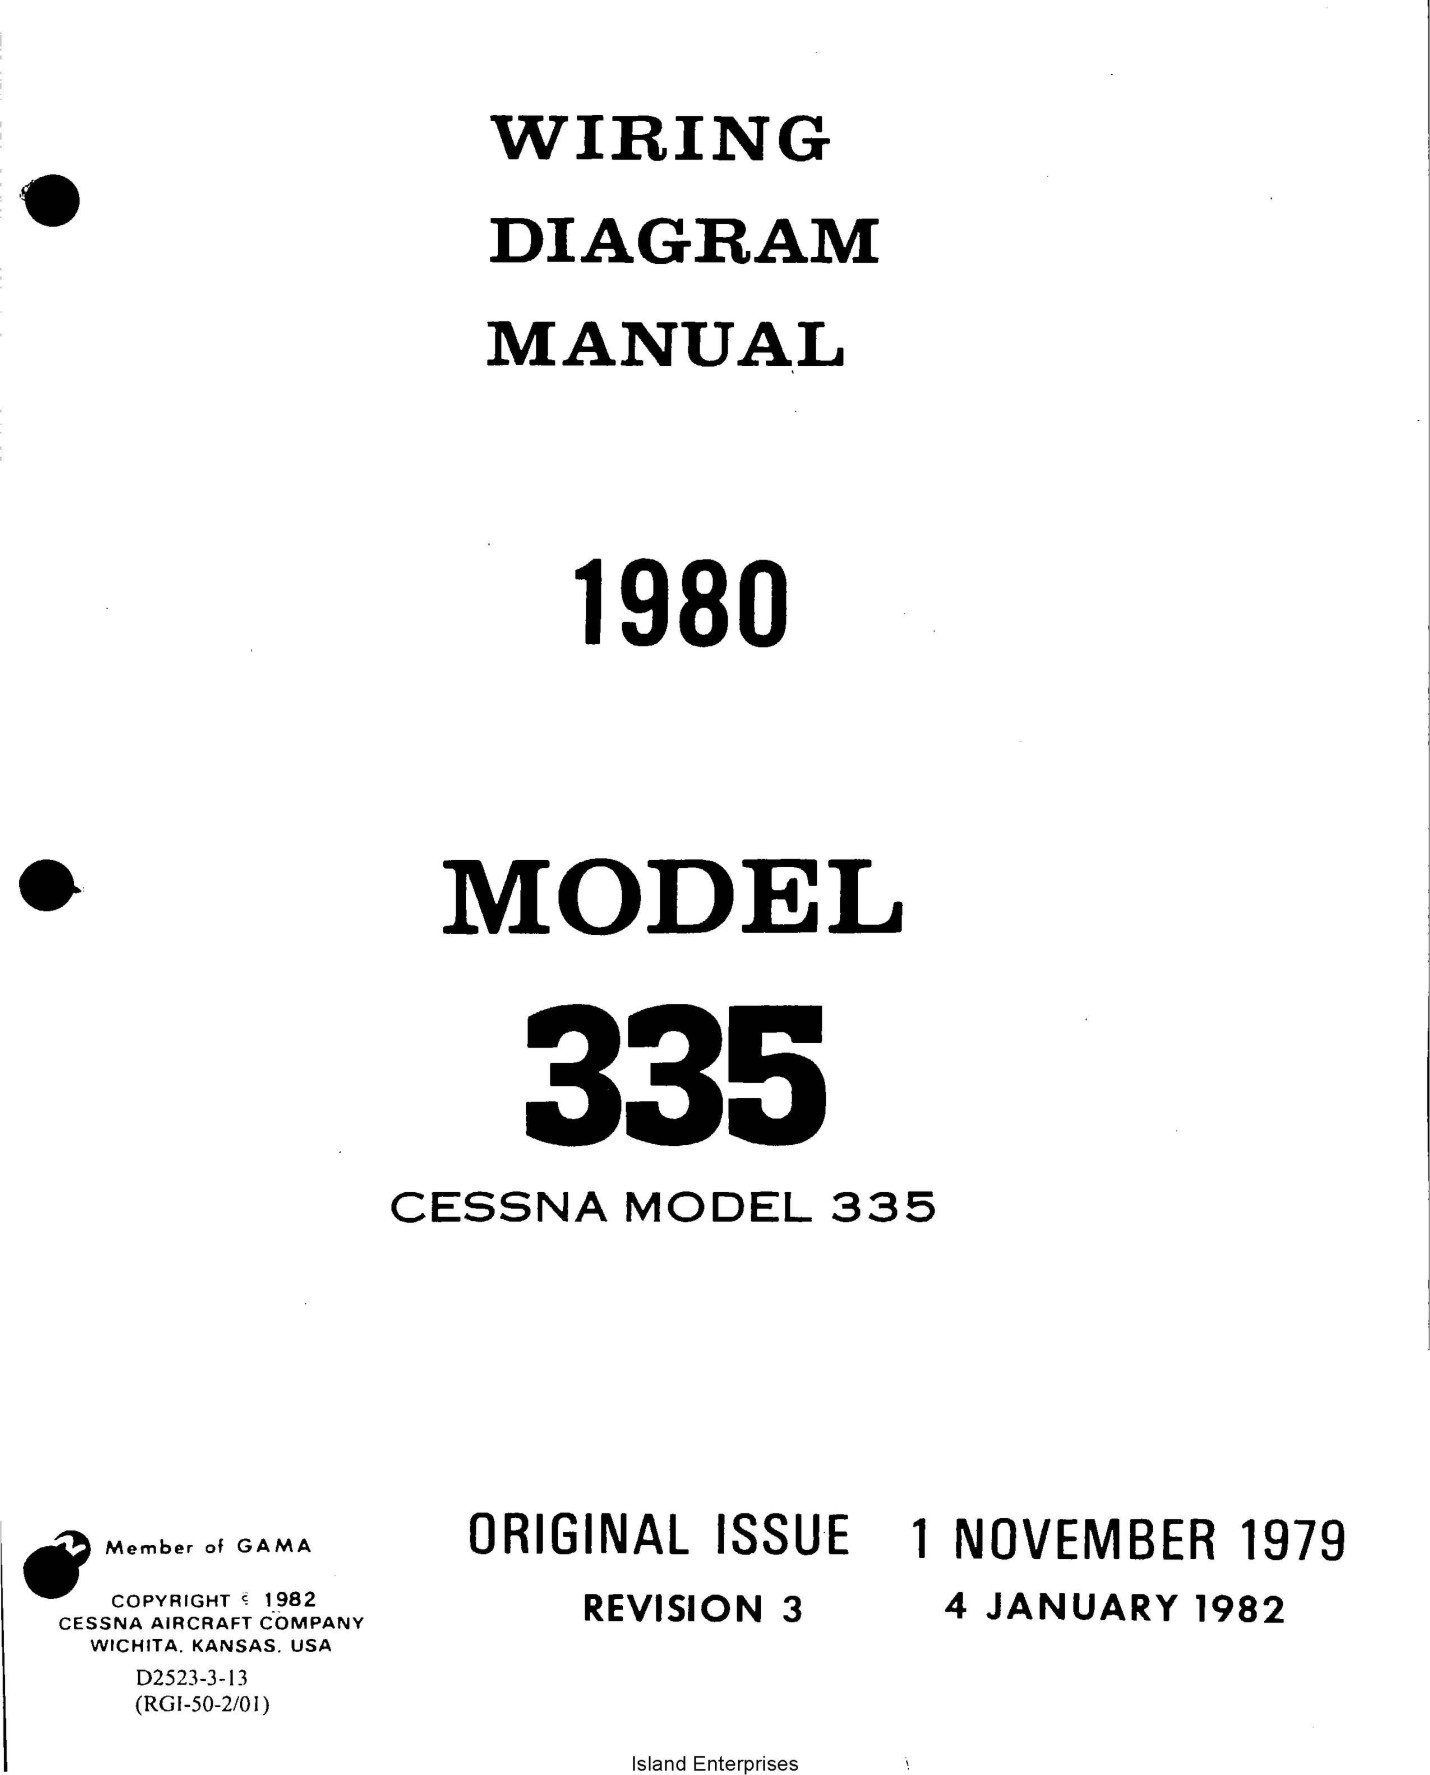 Cessna Model 335 Wiring Diagram Manual 1980 D2523